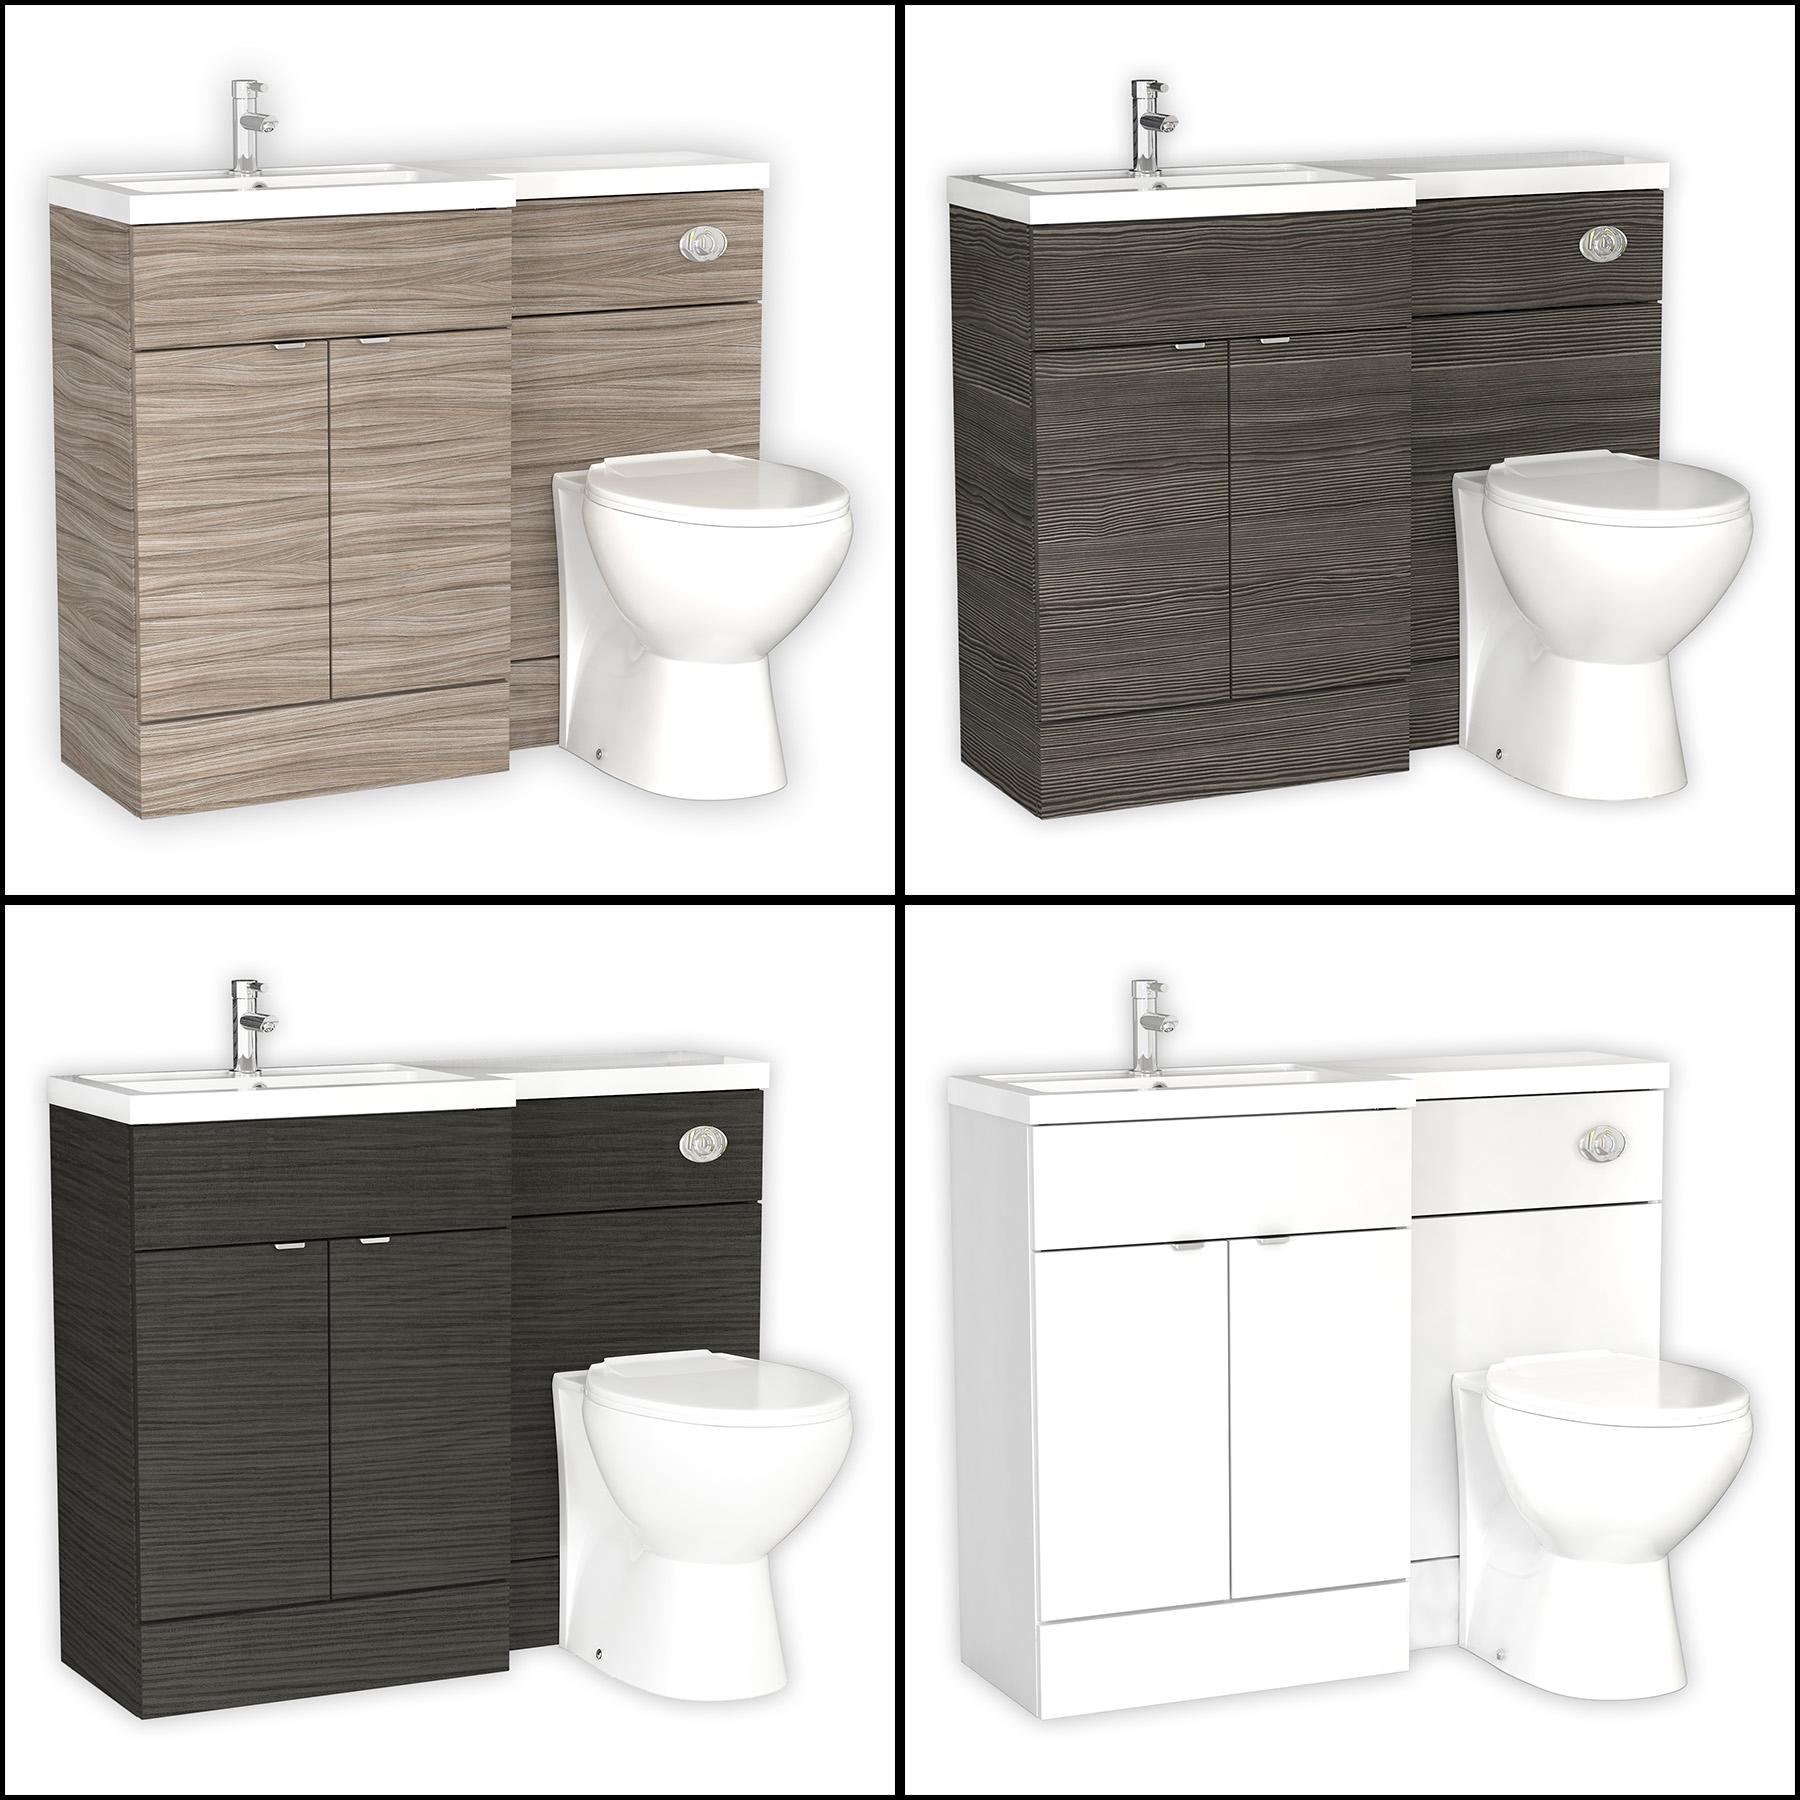 1100mm Hudson Reed L Shape Bathroom Furniture Packs Vanity WC Unit ...